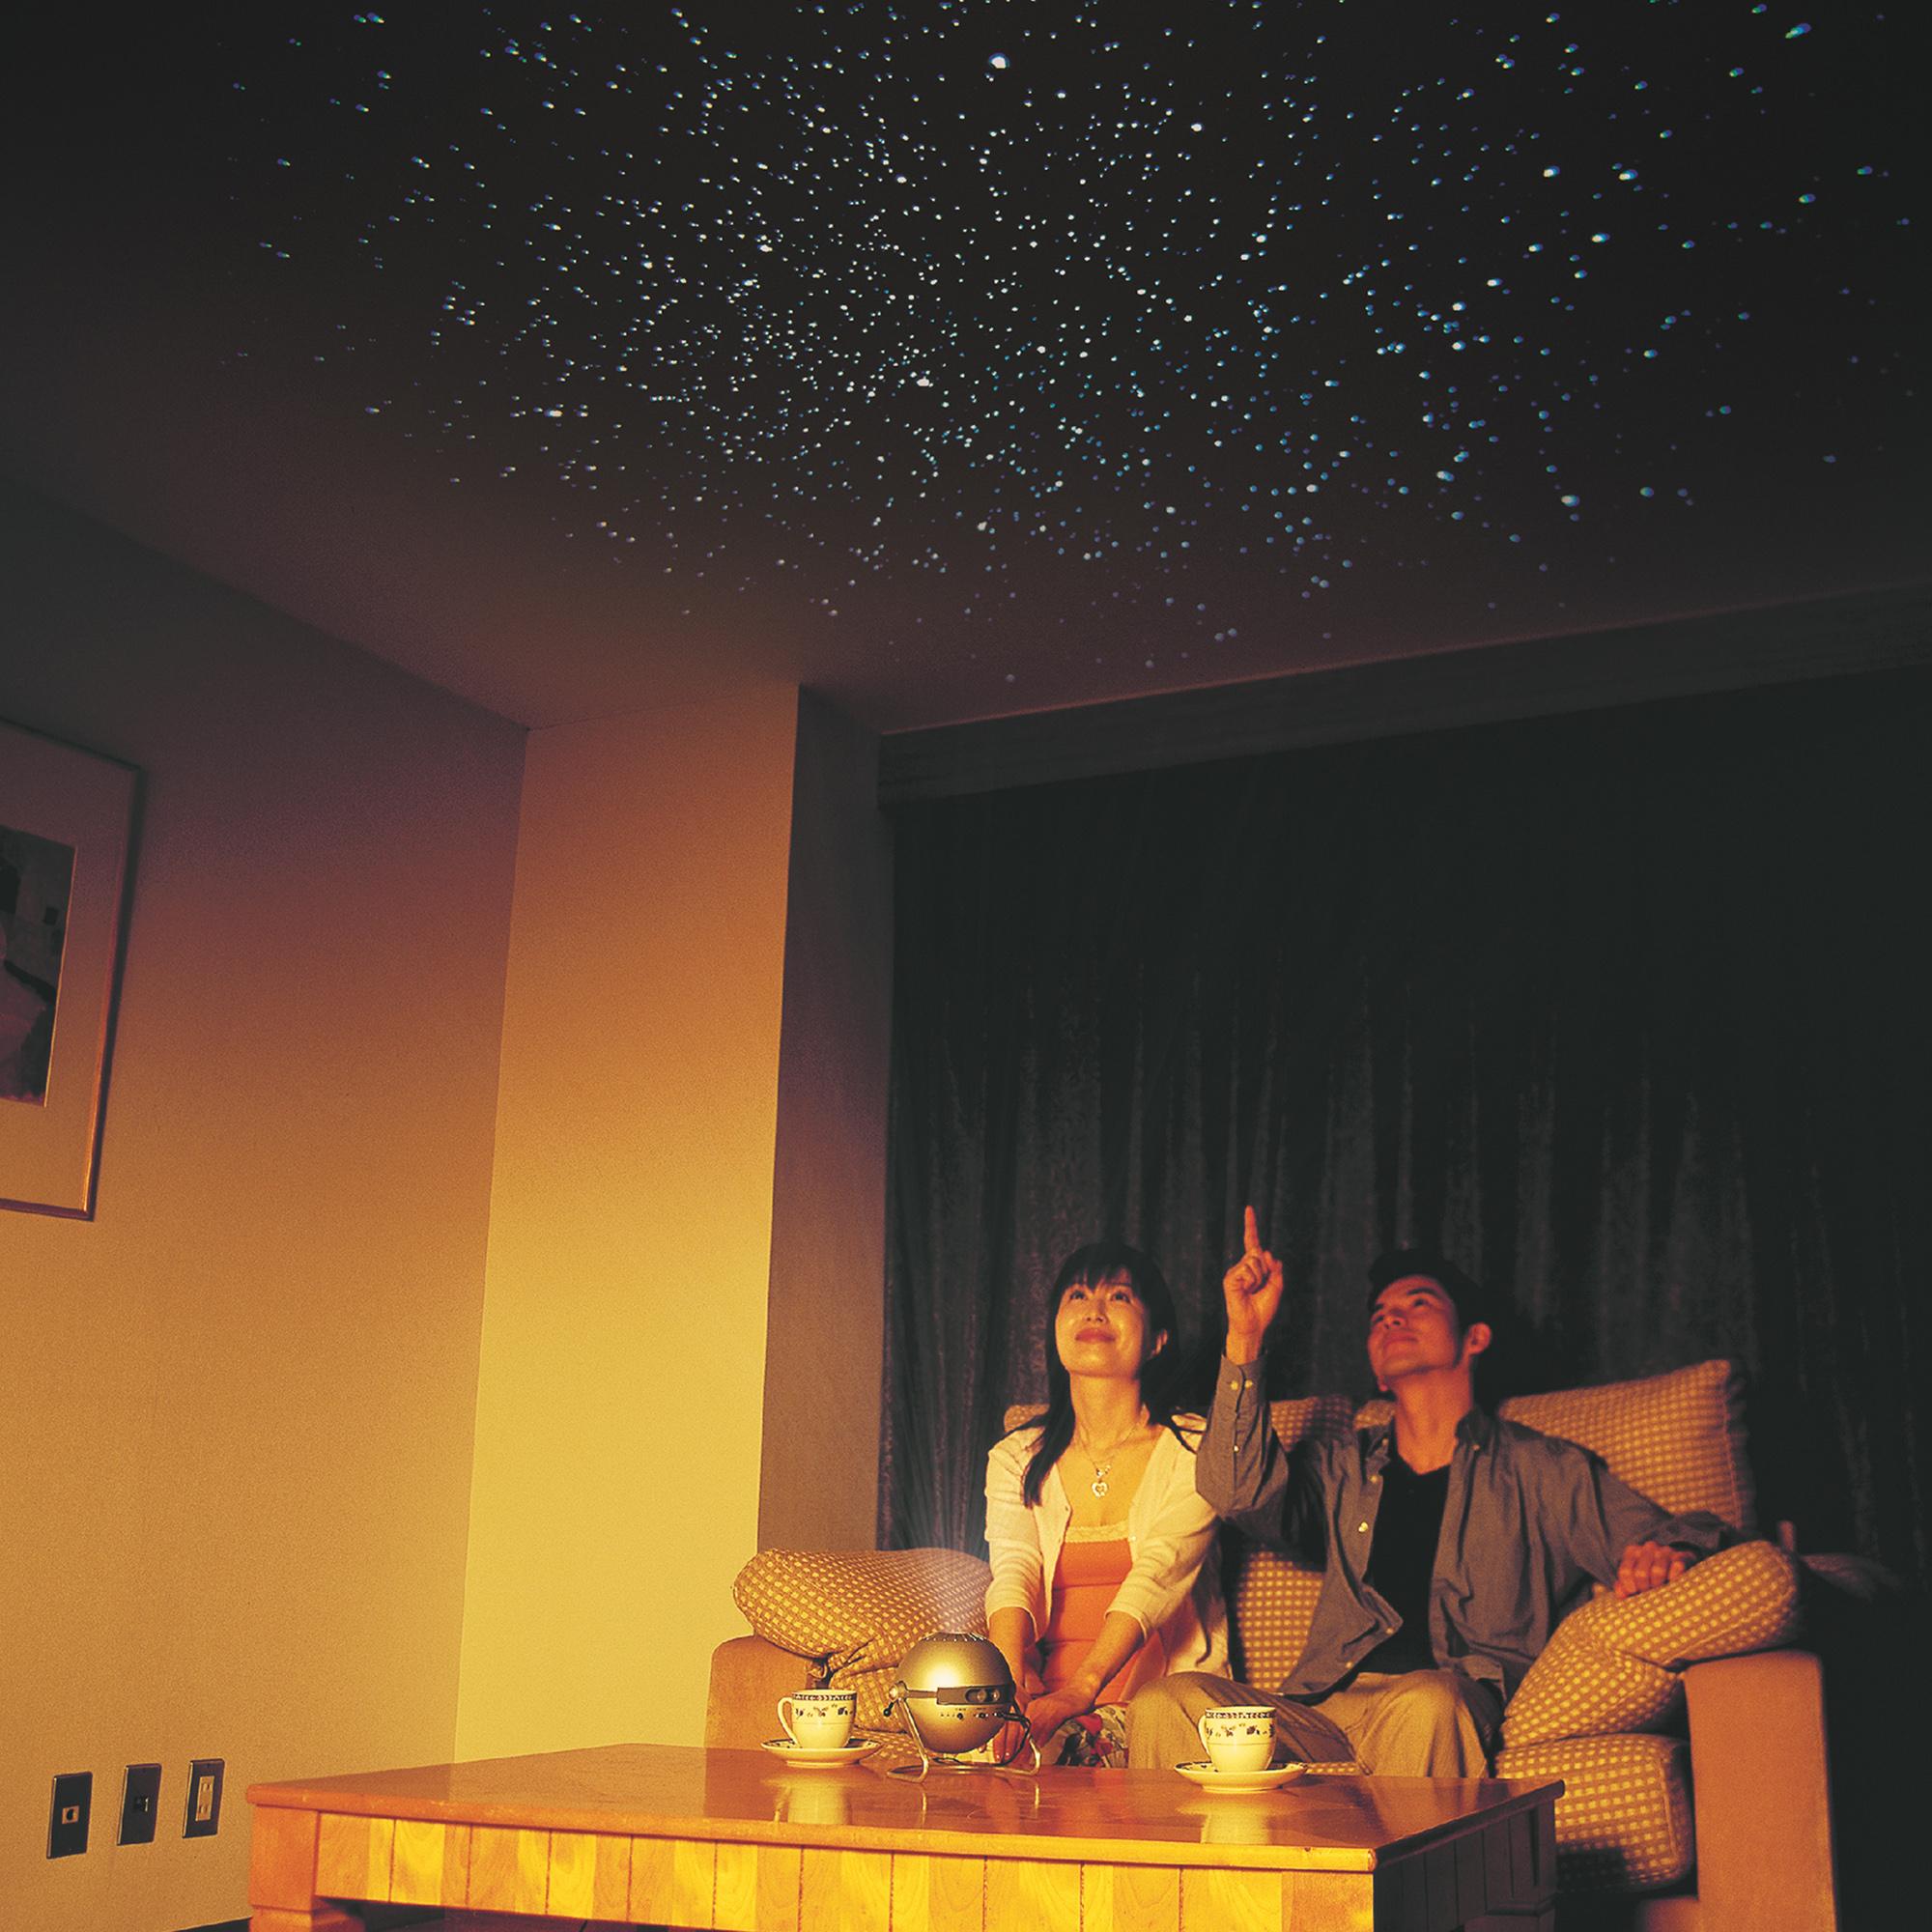 Sega Toys Planetarium - Sternenhimmel Projektor weiß - 5